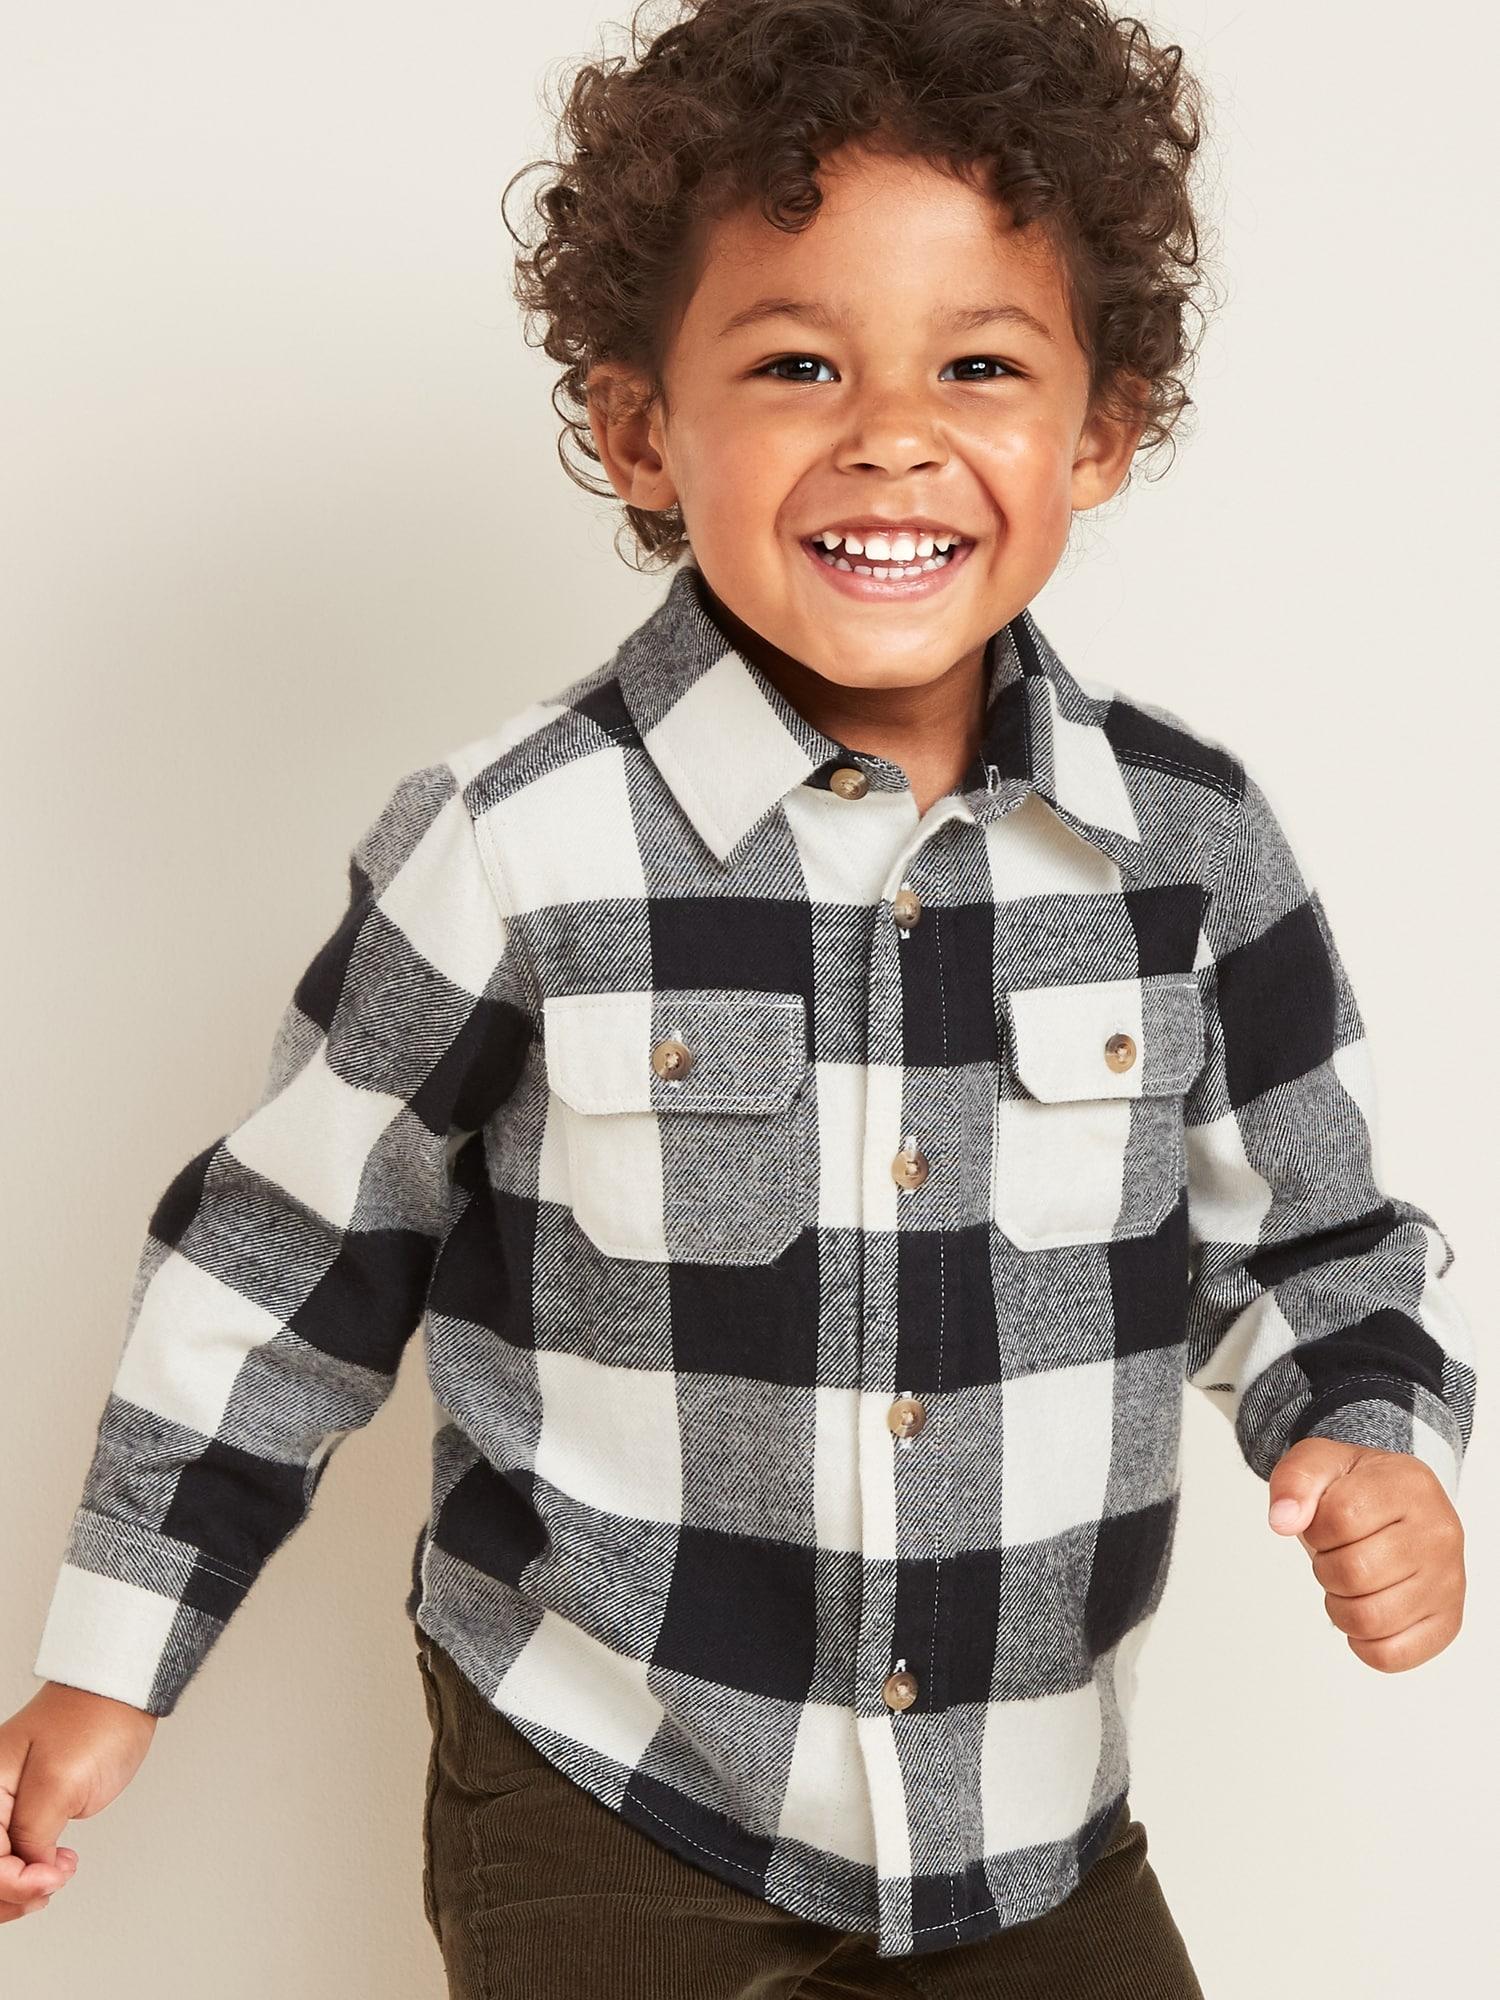 Baby Gap Boy/'s Red Buffalo Plaid Cardigan Sweater Size 2T 4T